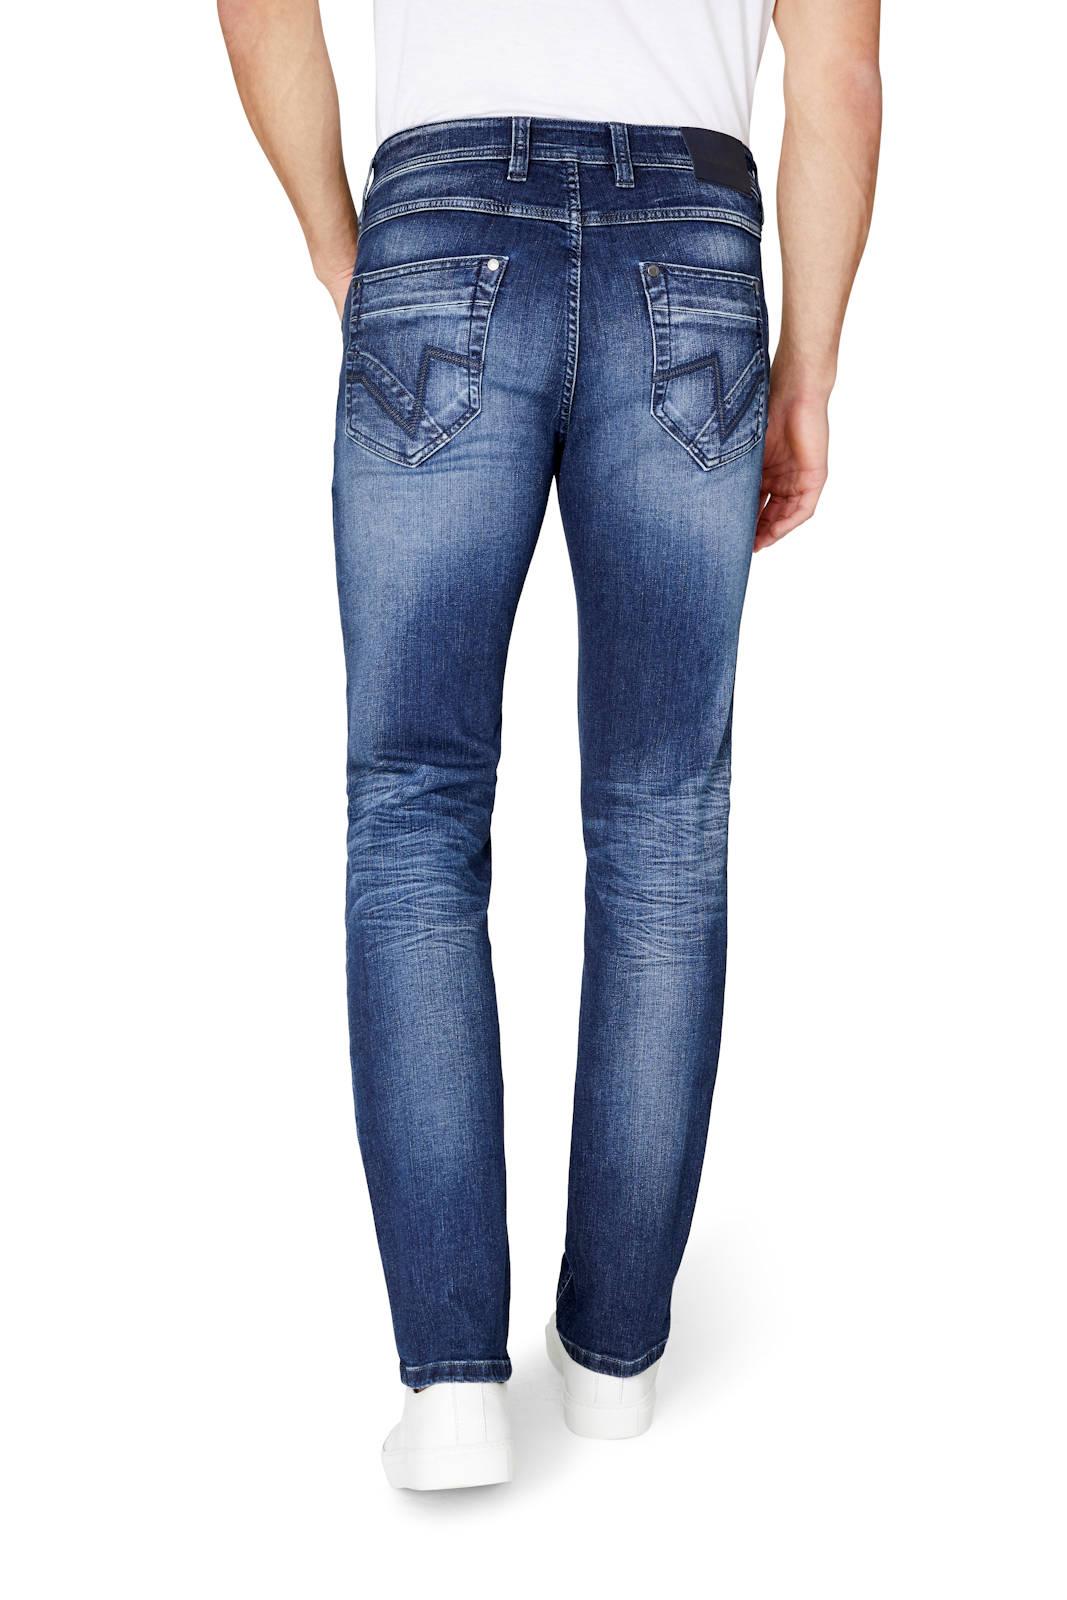 Atelier-GARDEUR-Jeans-BILL-8-Modern-Fit-Herren-Hose-Slim-Leg-Denim-NEU Indexbild 8